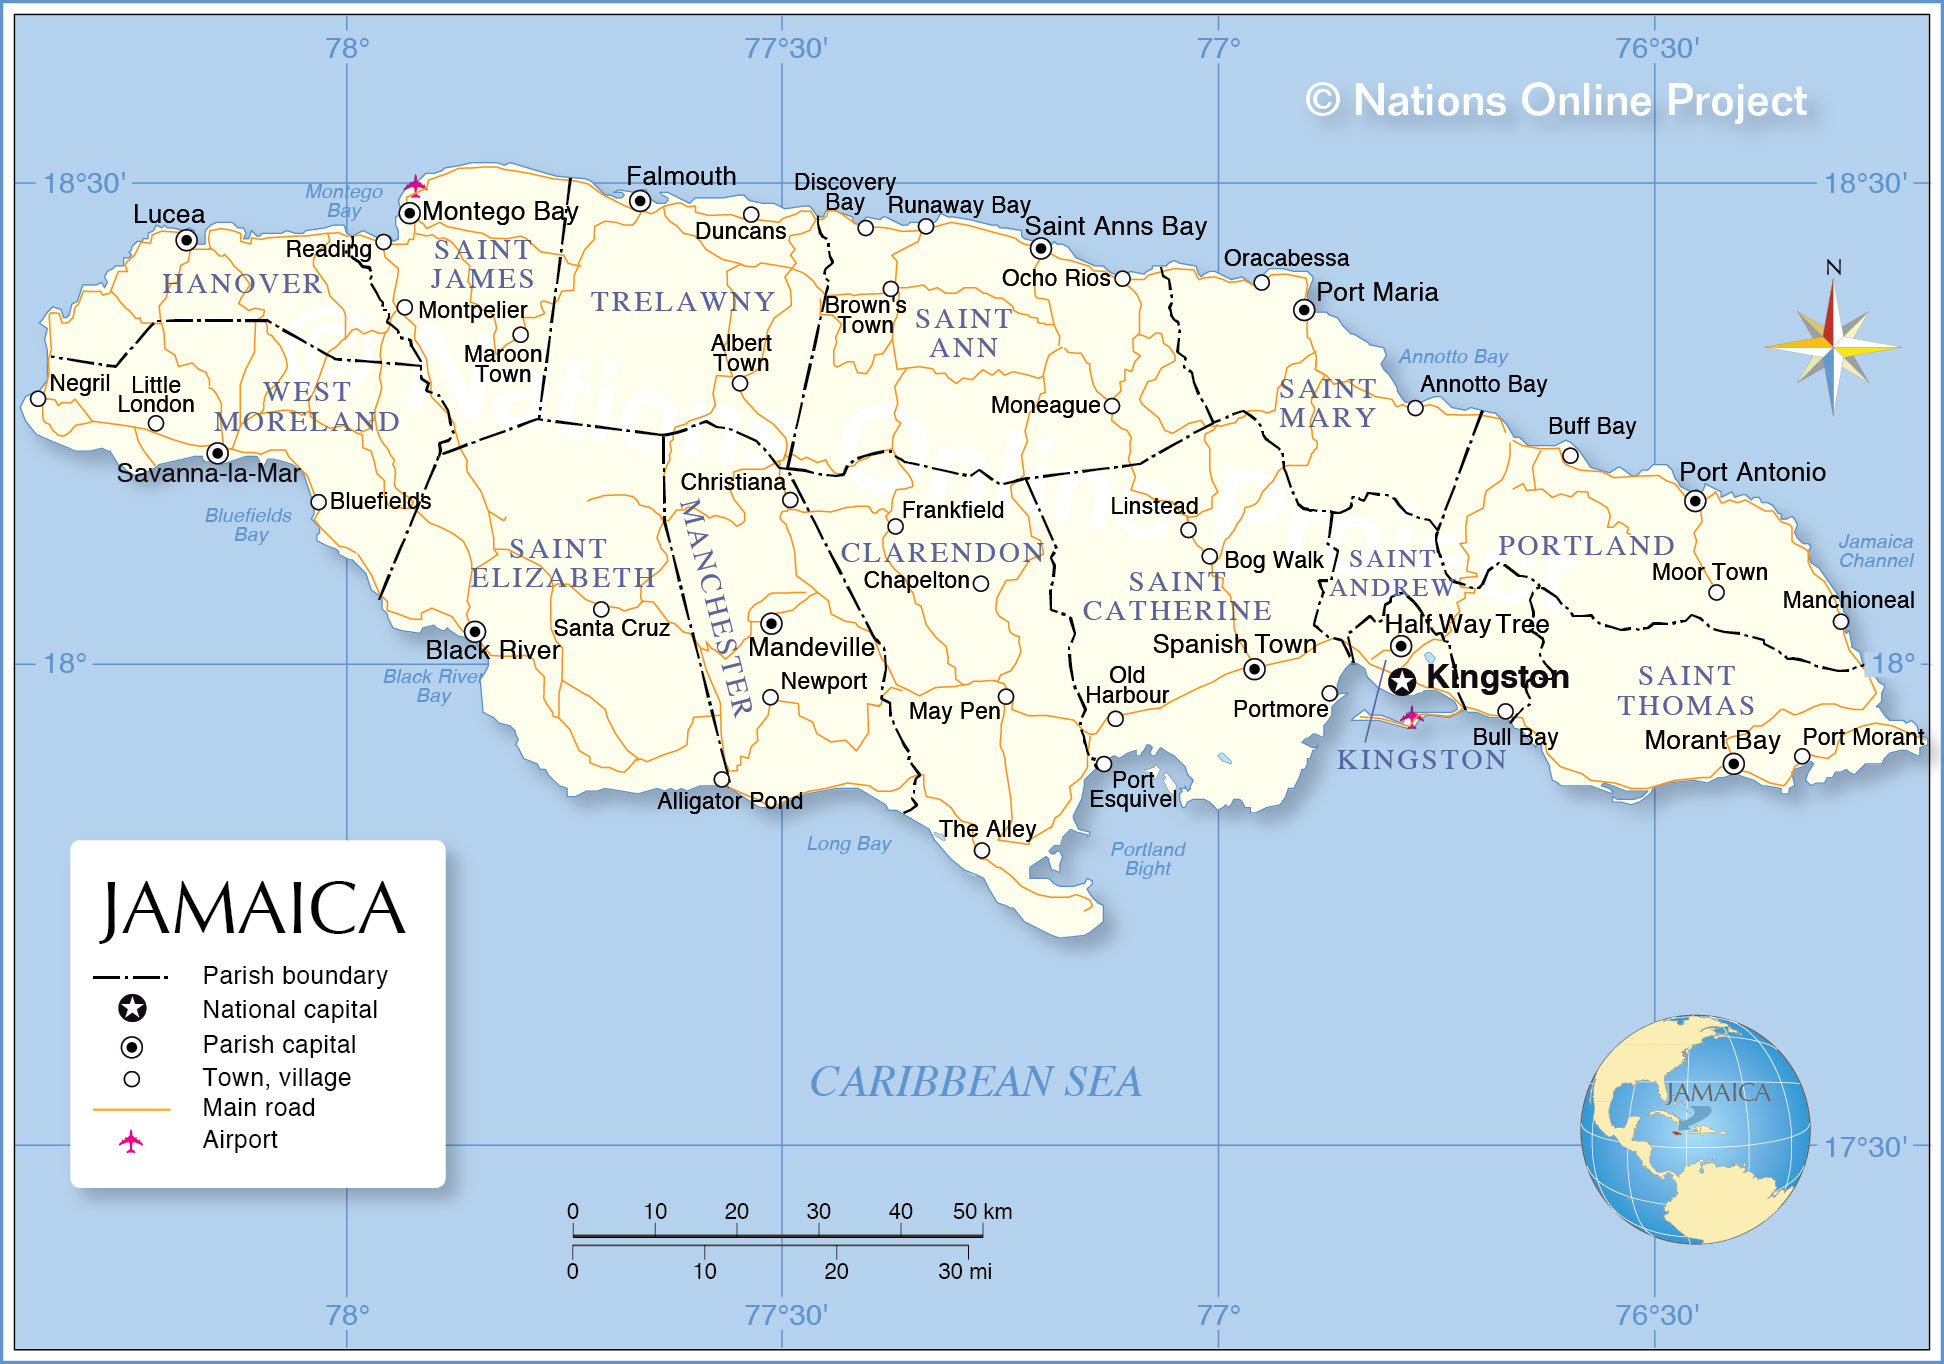 14 Parishes Jamaica And Their Capitals